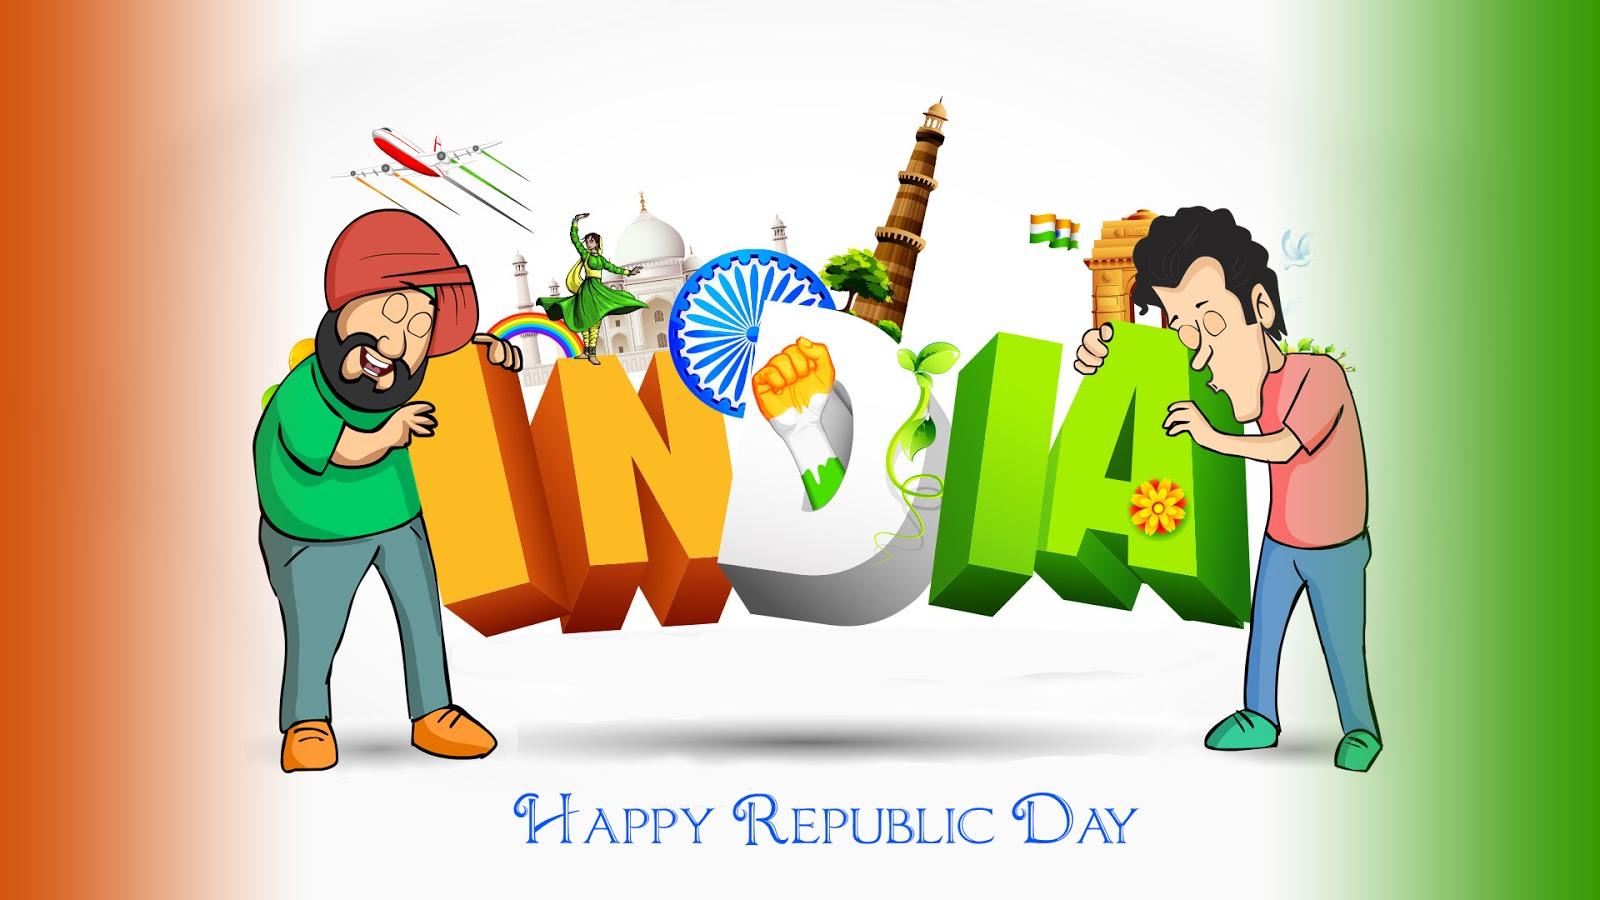 happy republic day th speech essay wishes poem on republic day